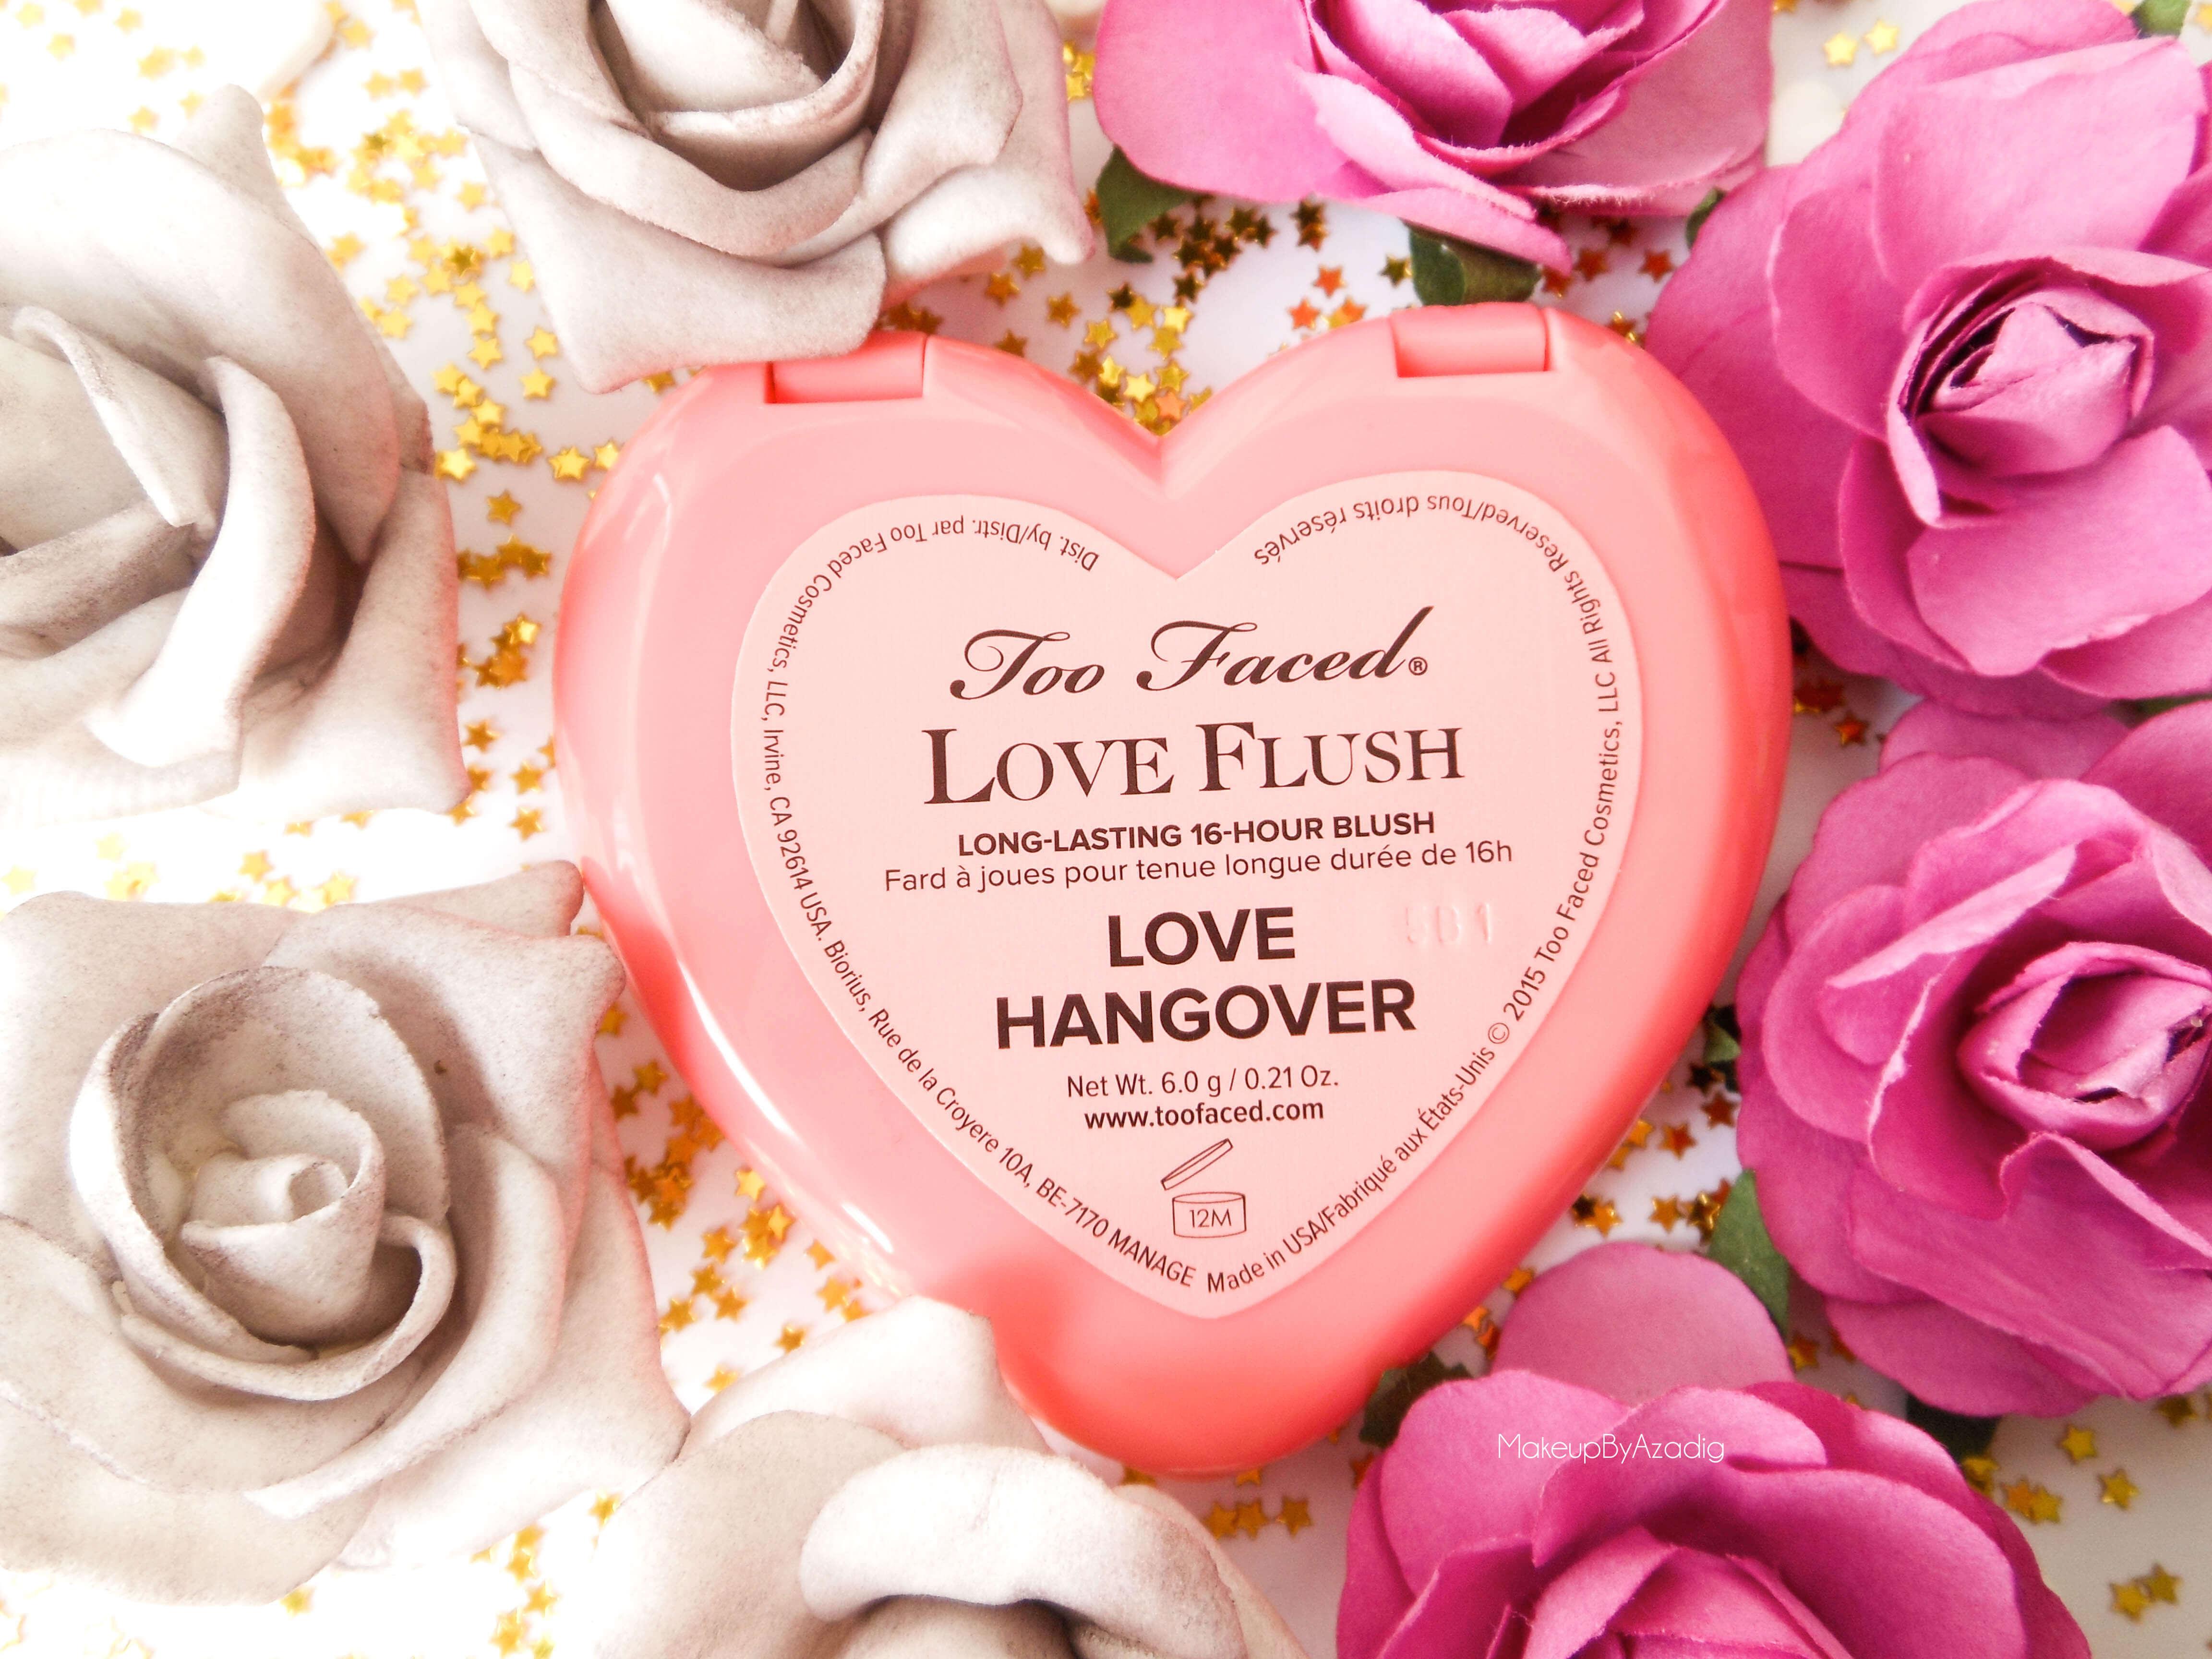 makeupbyazadig-love-flush-blush-too-faced-love-hangover-blog-influencer-sephora-france-flowers